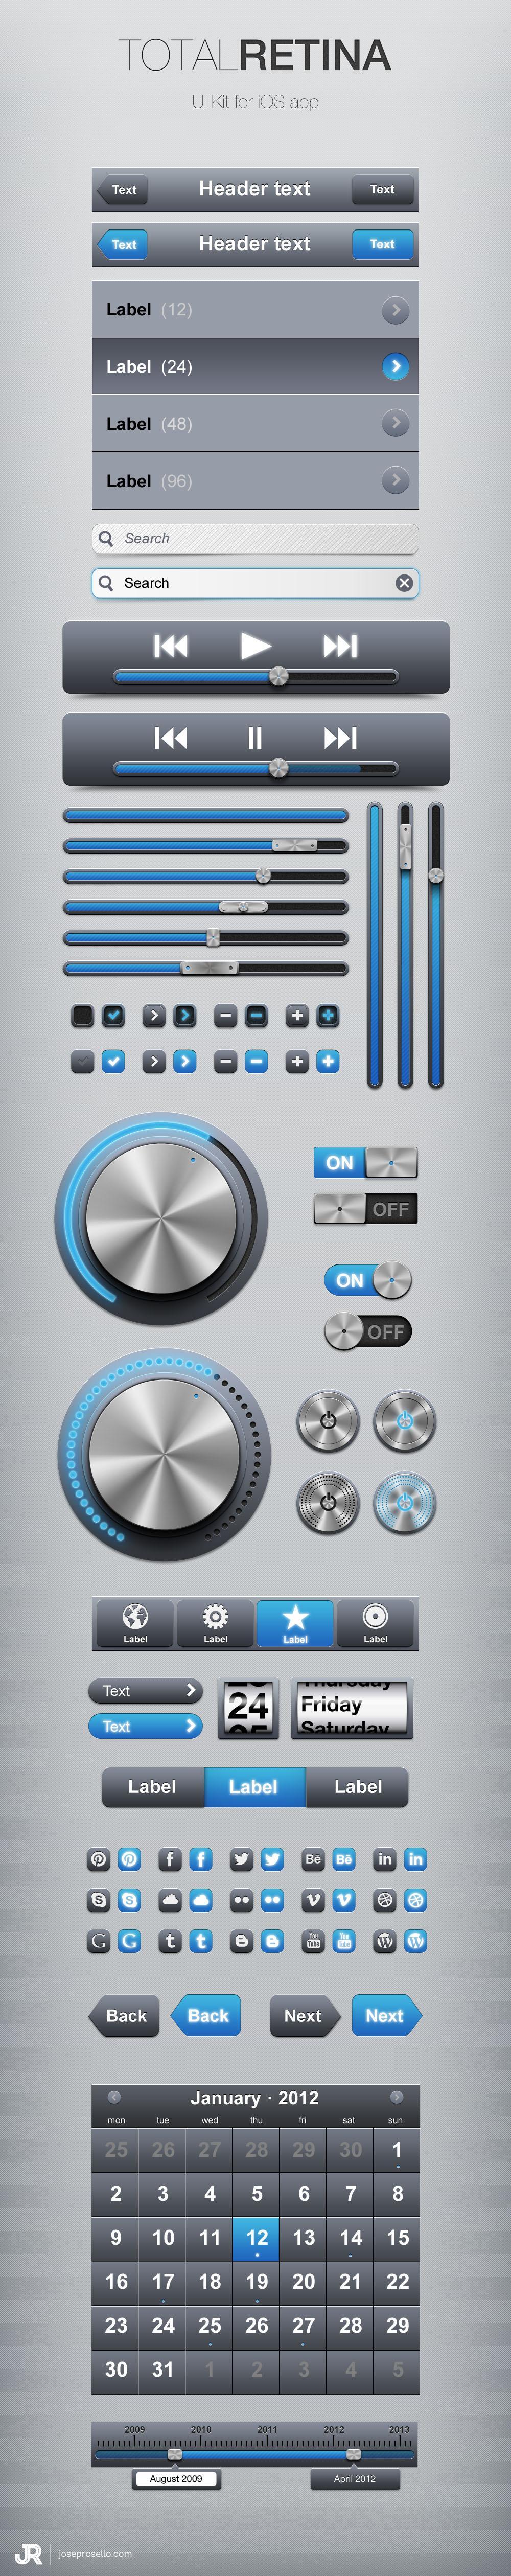 Total Retina UI Kit (PSD) - Designer First